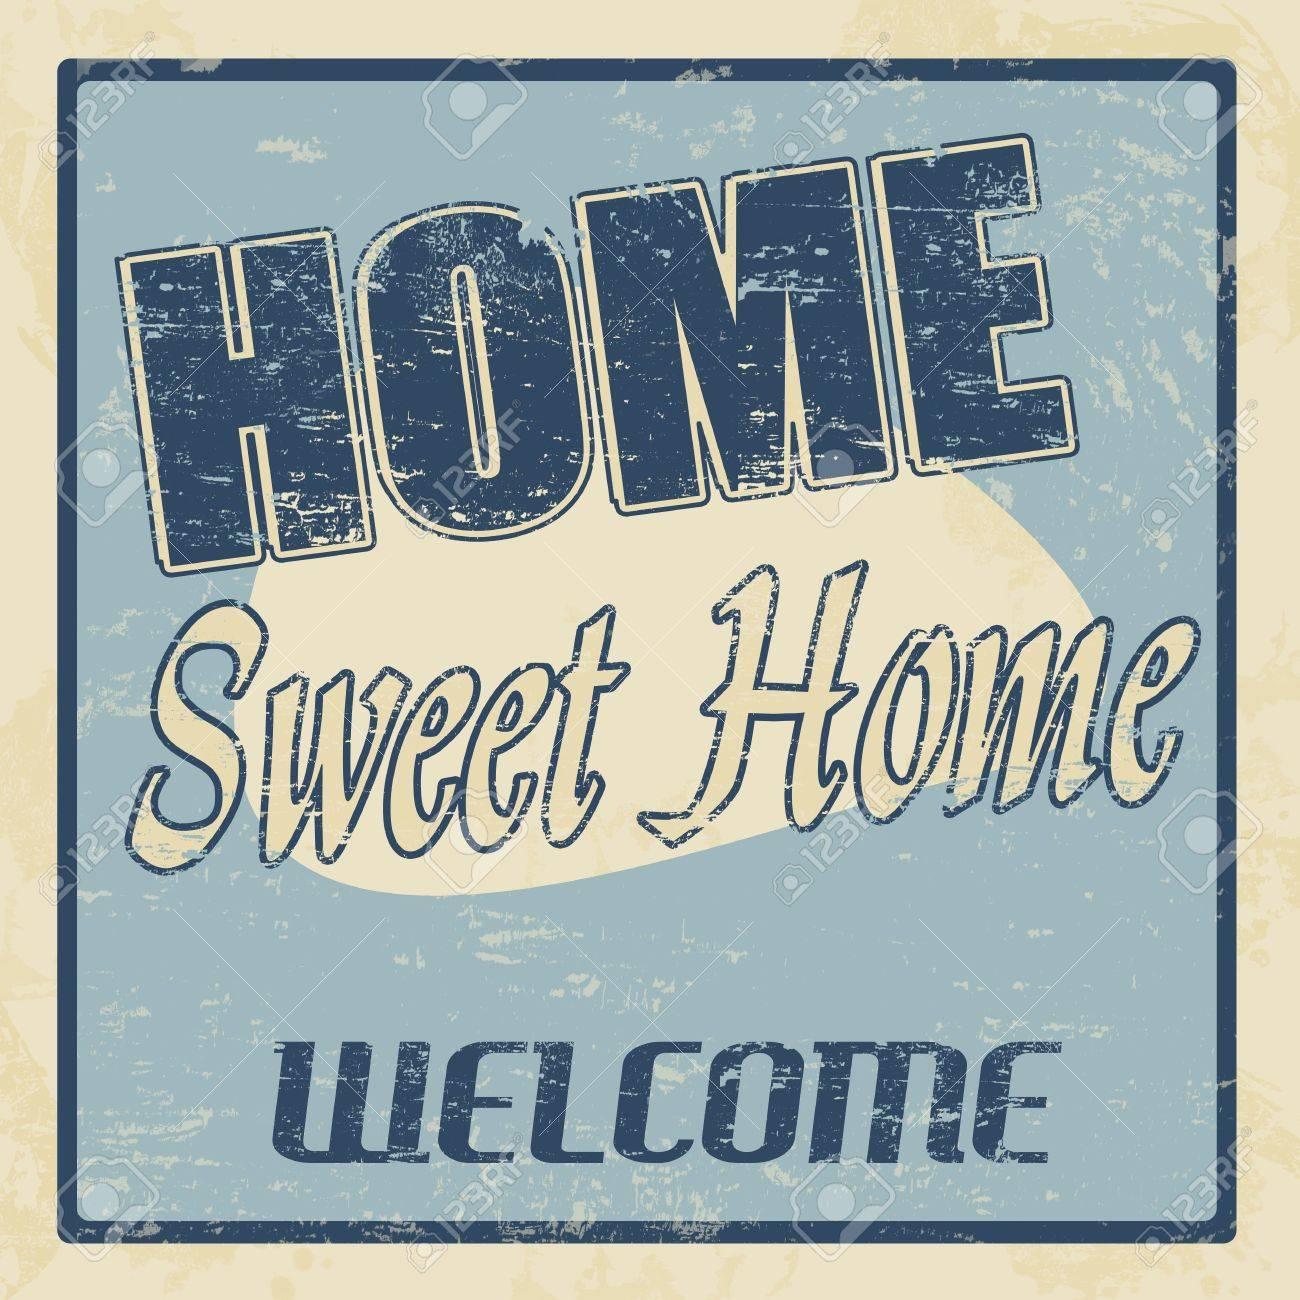 Home Sweet Home Vintage vintage home sweet home vintage retro grunge poster, illustrator